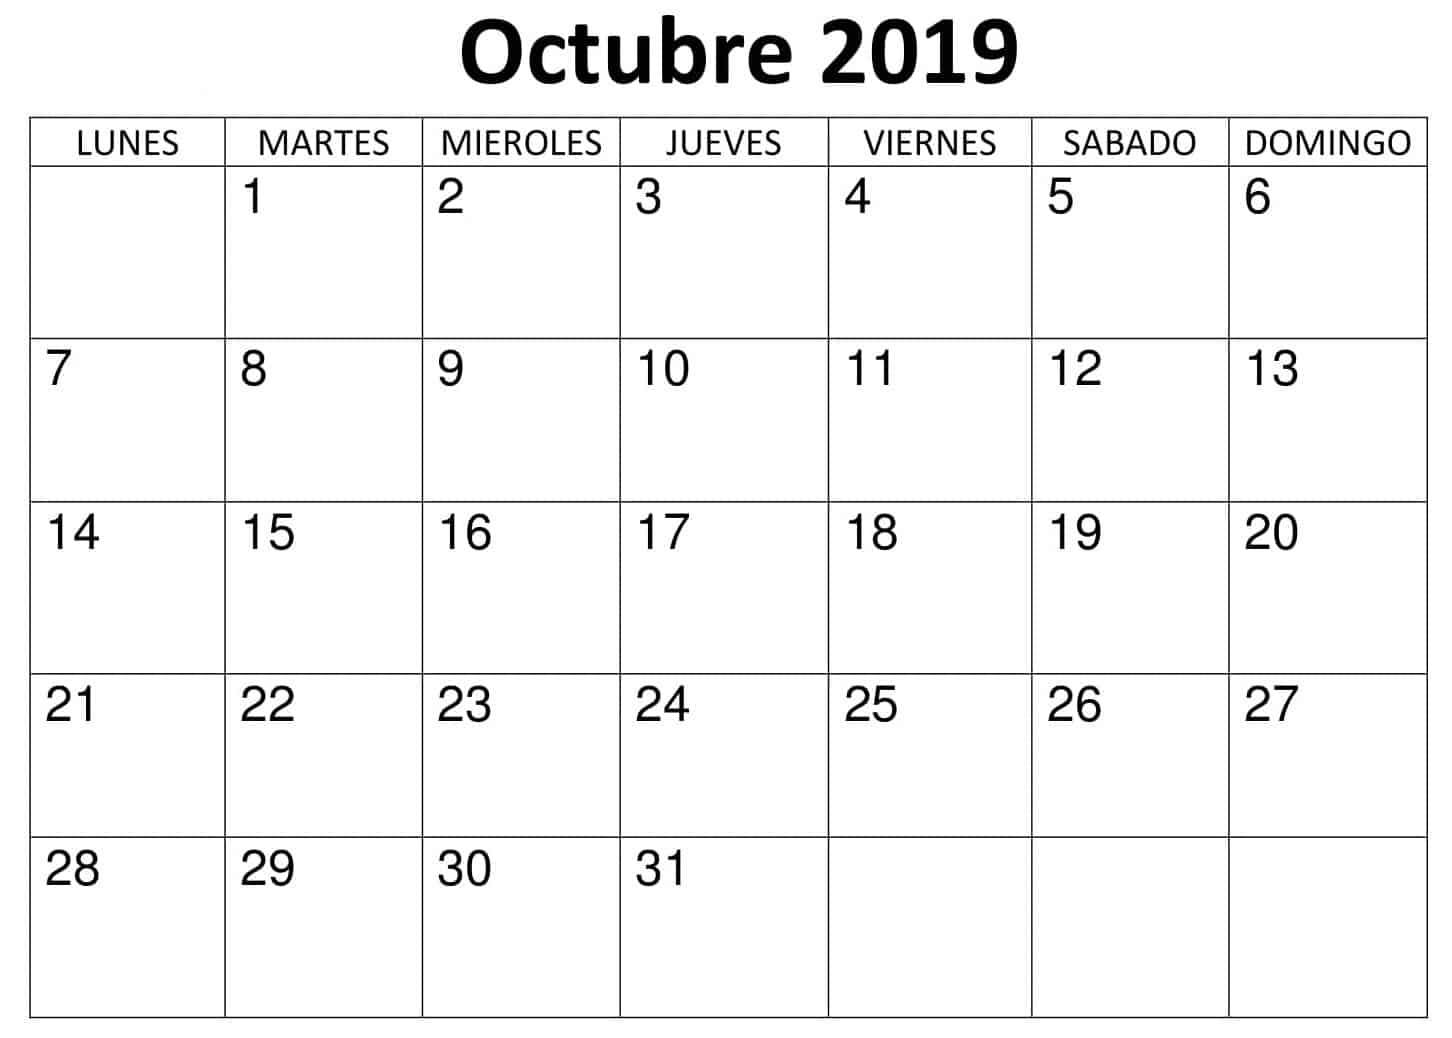 Calendario Diario Para Imprimir 2019.Gratis Calendario Octubre 2019 Para Imprimir Nosovia Com